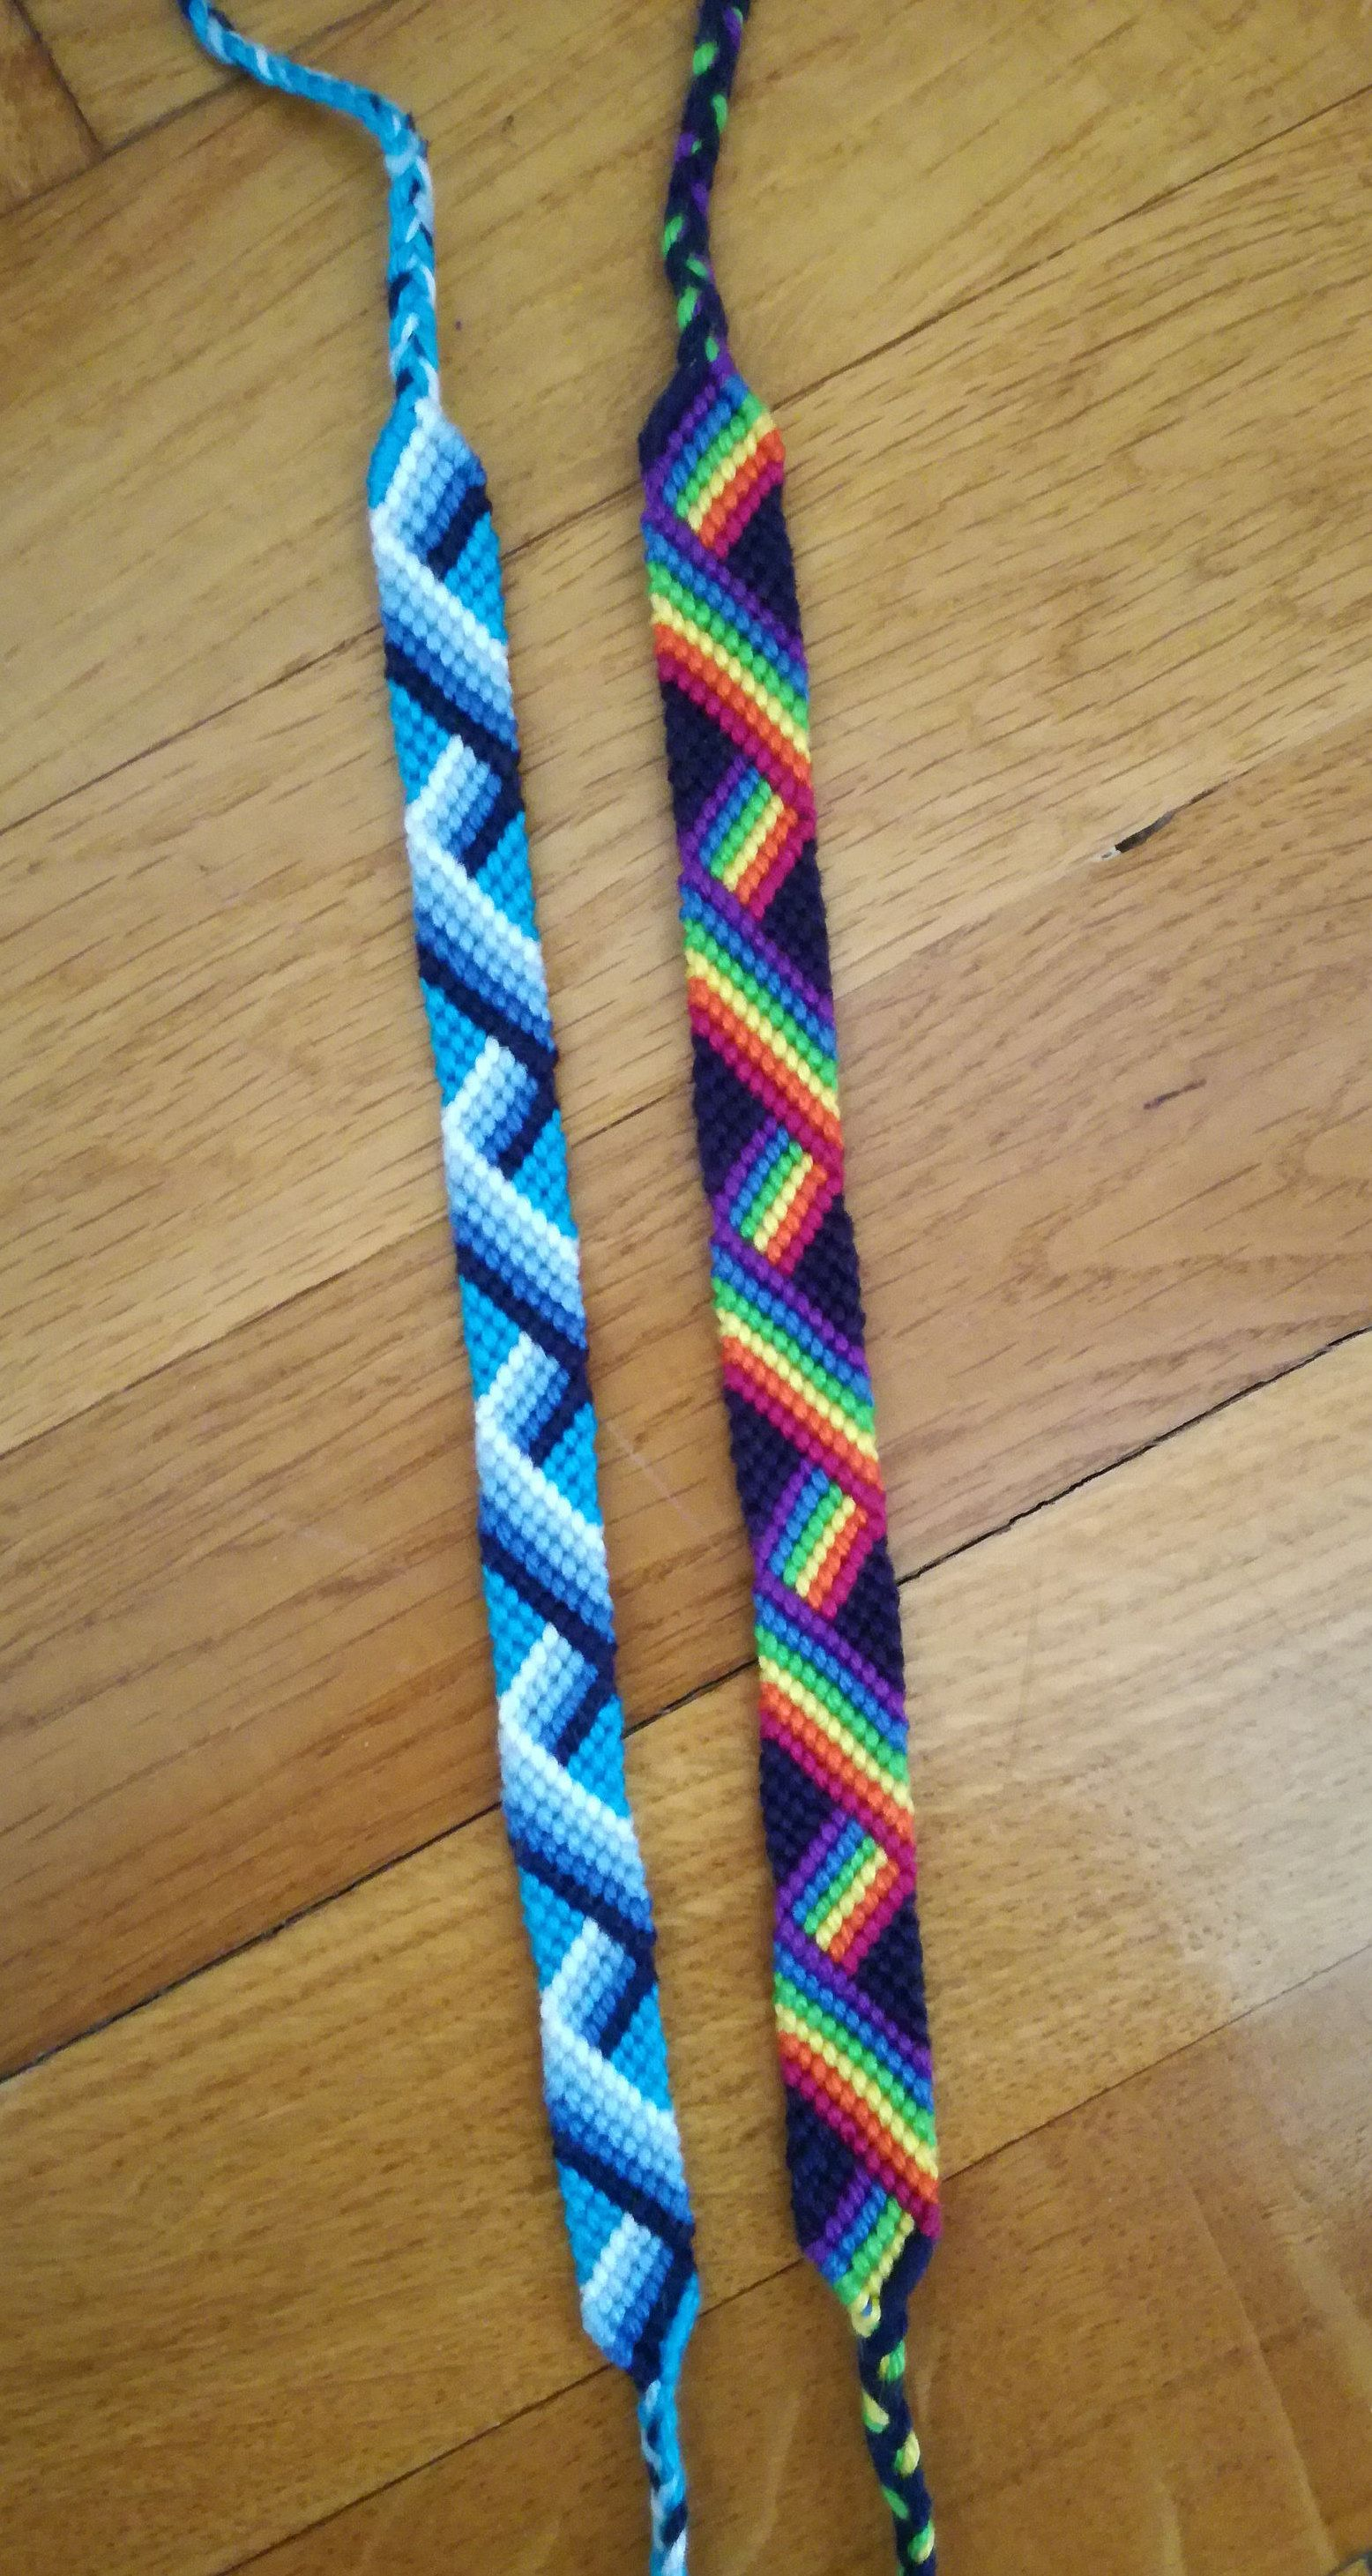 Zigzag friendship bracelet Rainbow knotted bracelet Custom string bracelet Wrist band Handwoven bracelet Woven jewelry Knot wrist cuff Boho